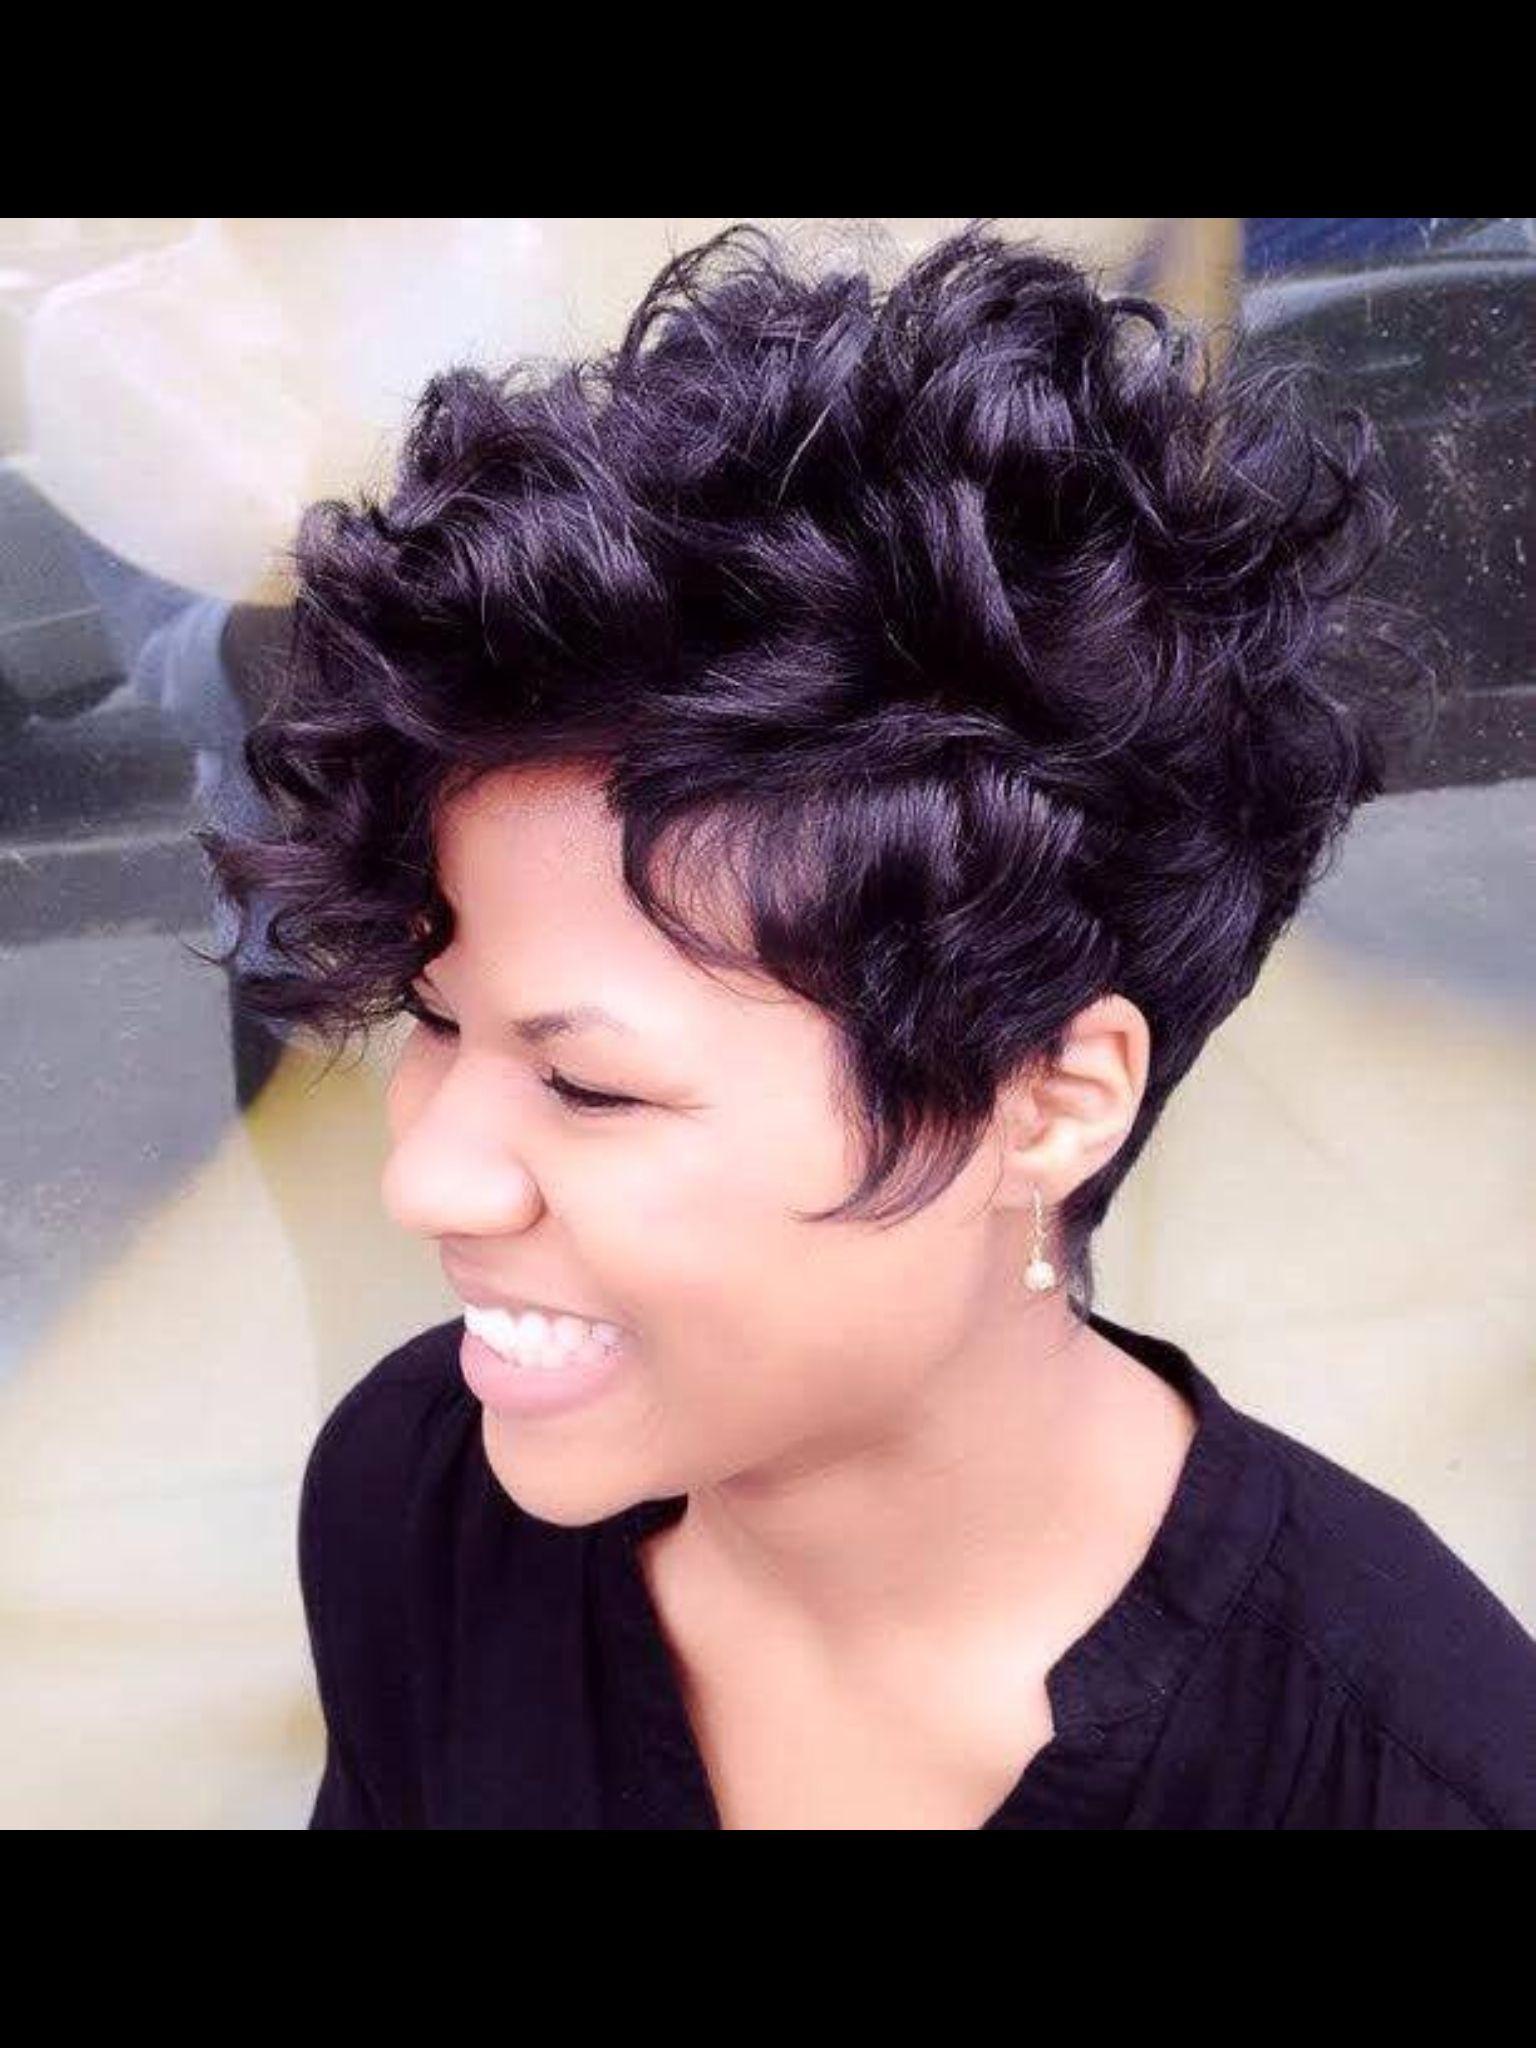 Cute curly hawk hairstyles i like pinterest curly short hair